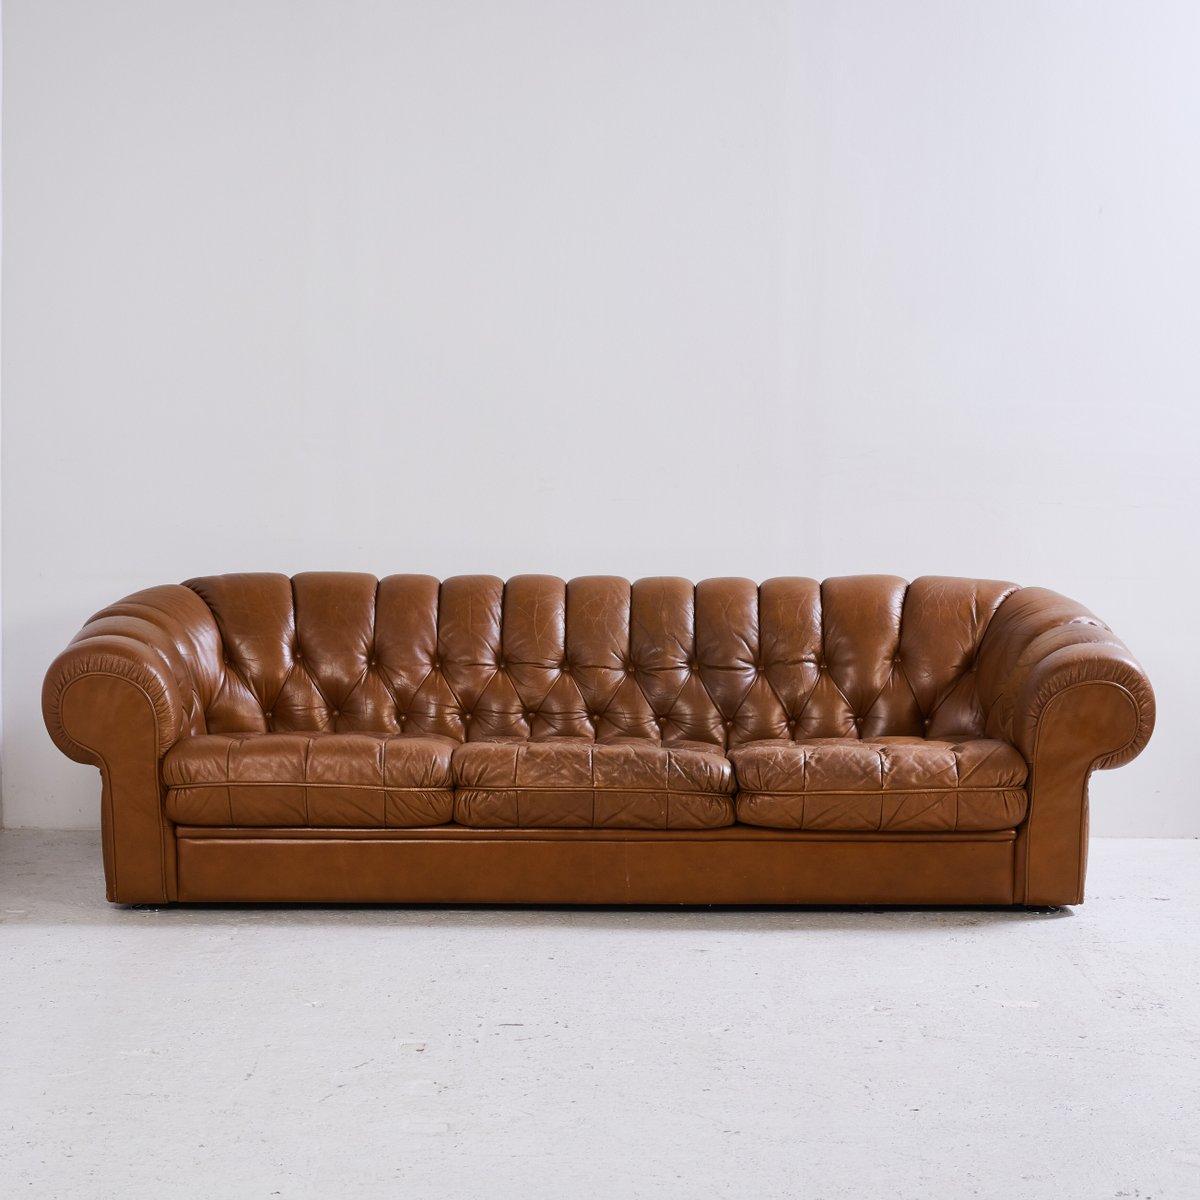 chesterfield sofa set aus leder 1970er bei pamono kaufen. Black Bedroom Furniture Sets. Home Design Ideas